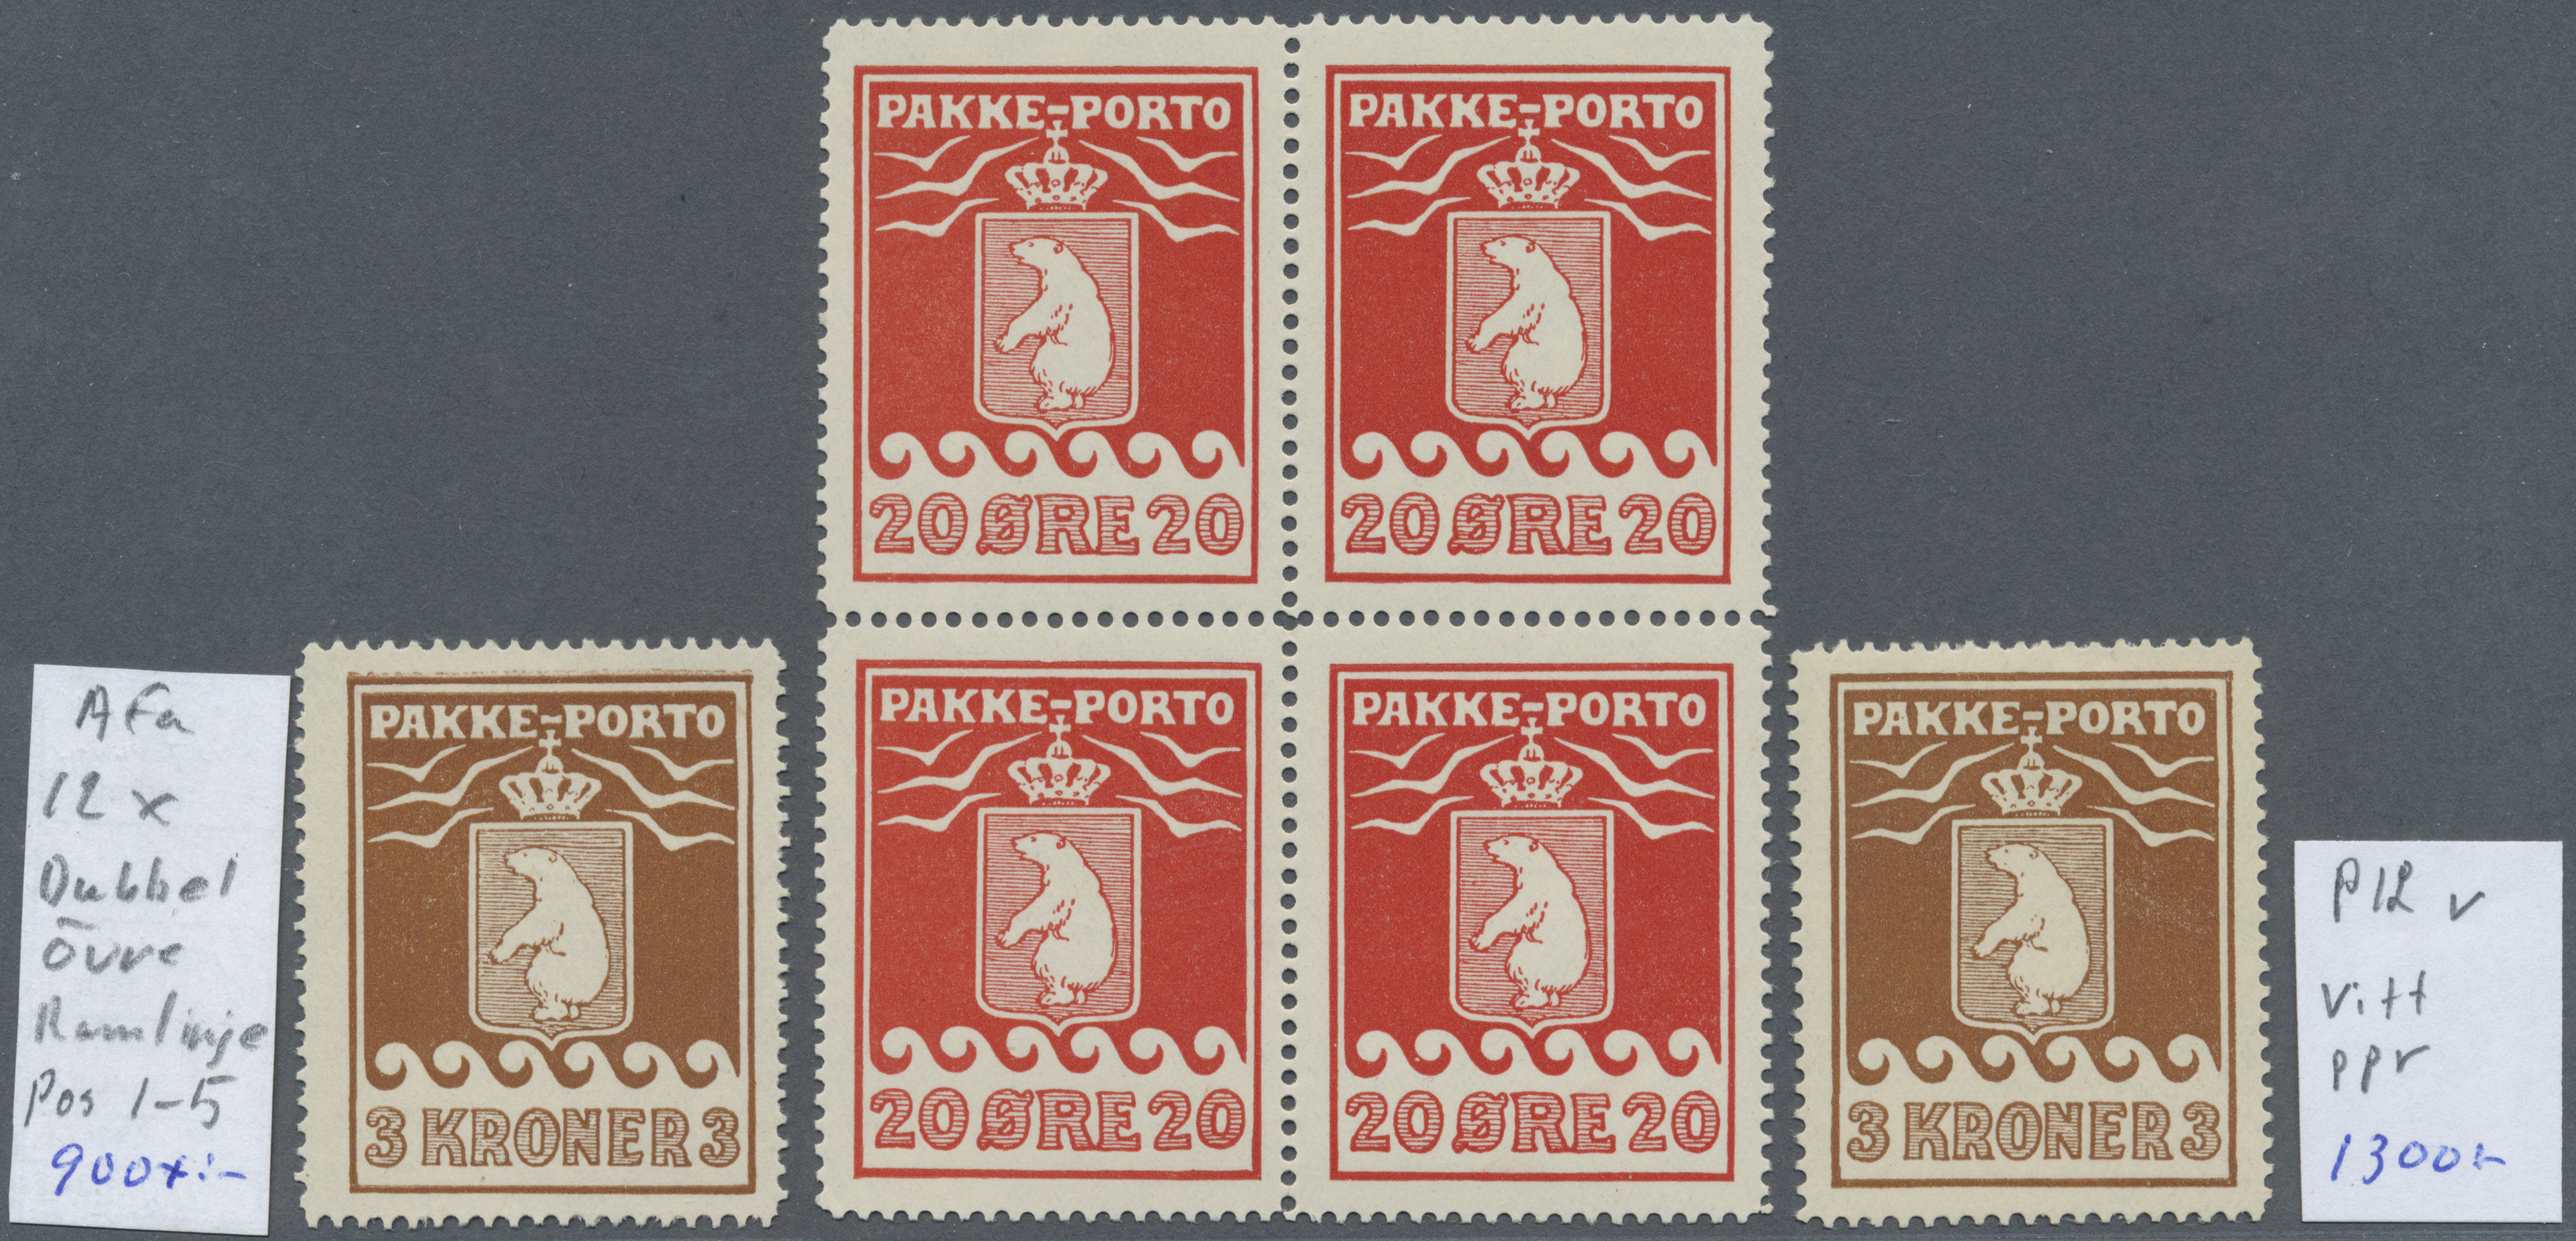 post danmark pakkeporto